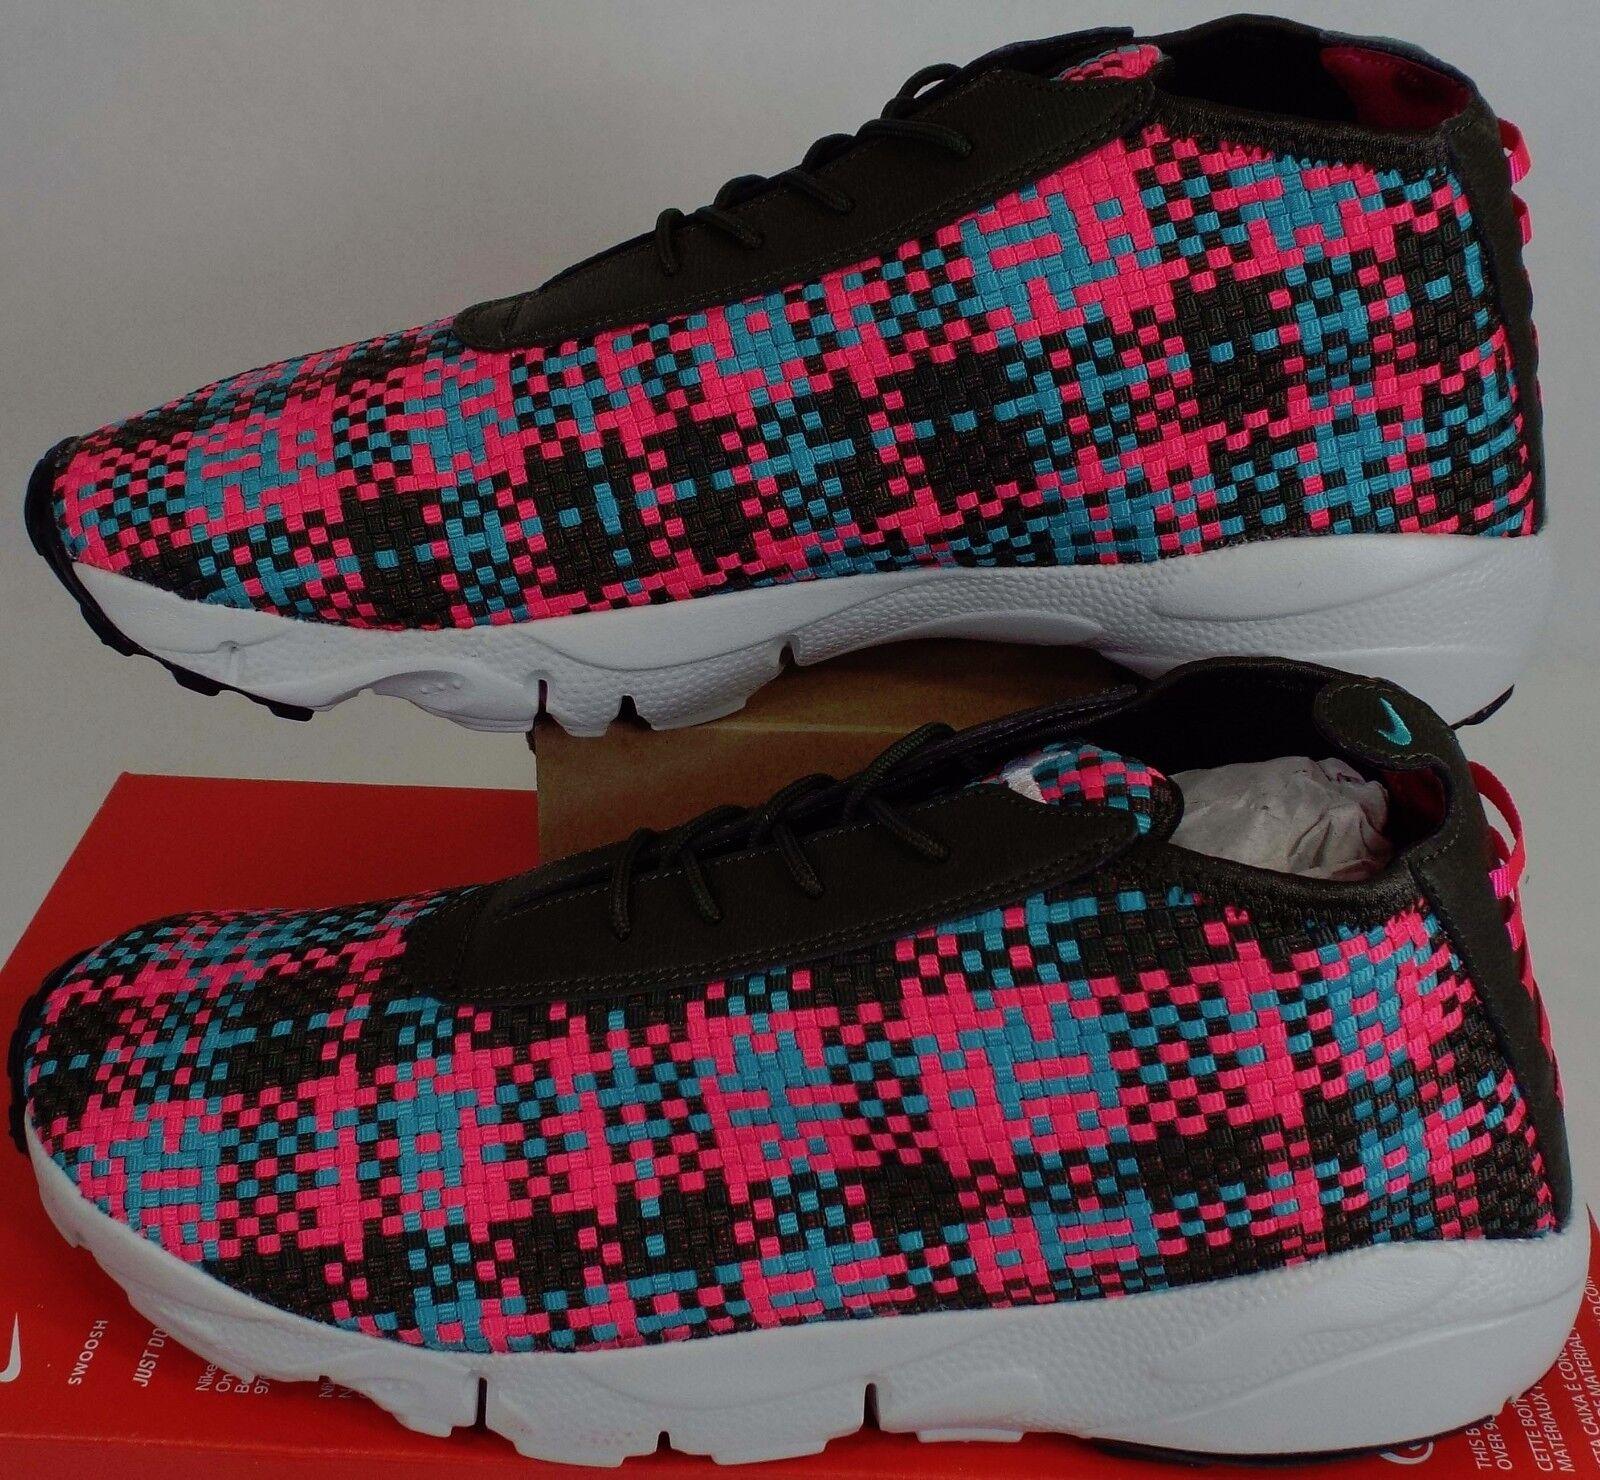 New Hommes 13 NIKE Air Footscape Desert Chukka Bottes Woven Chaussures  180 652822-300